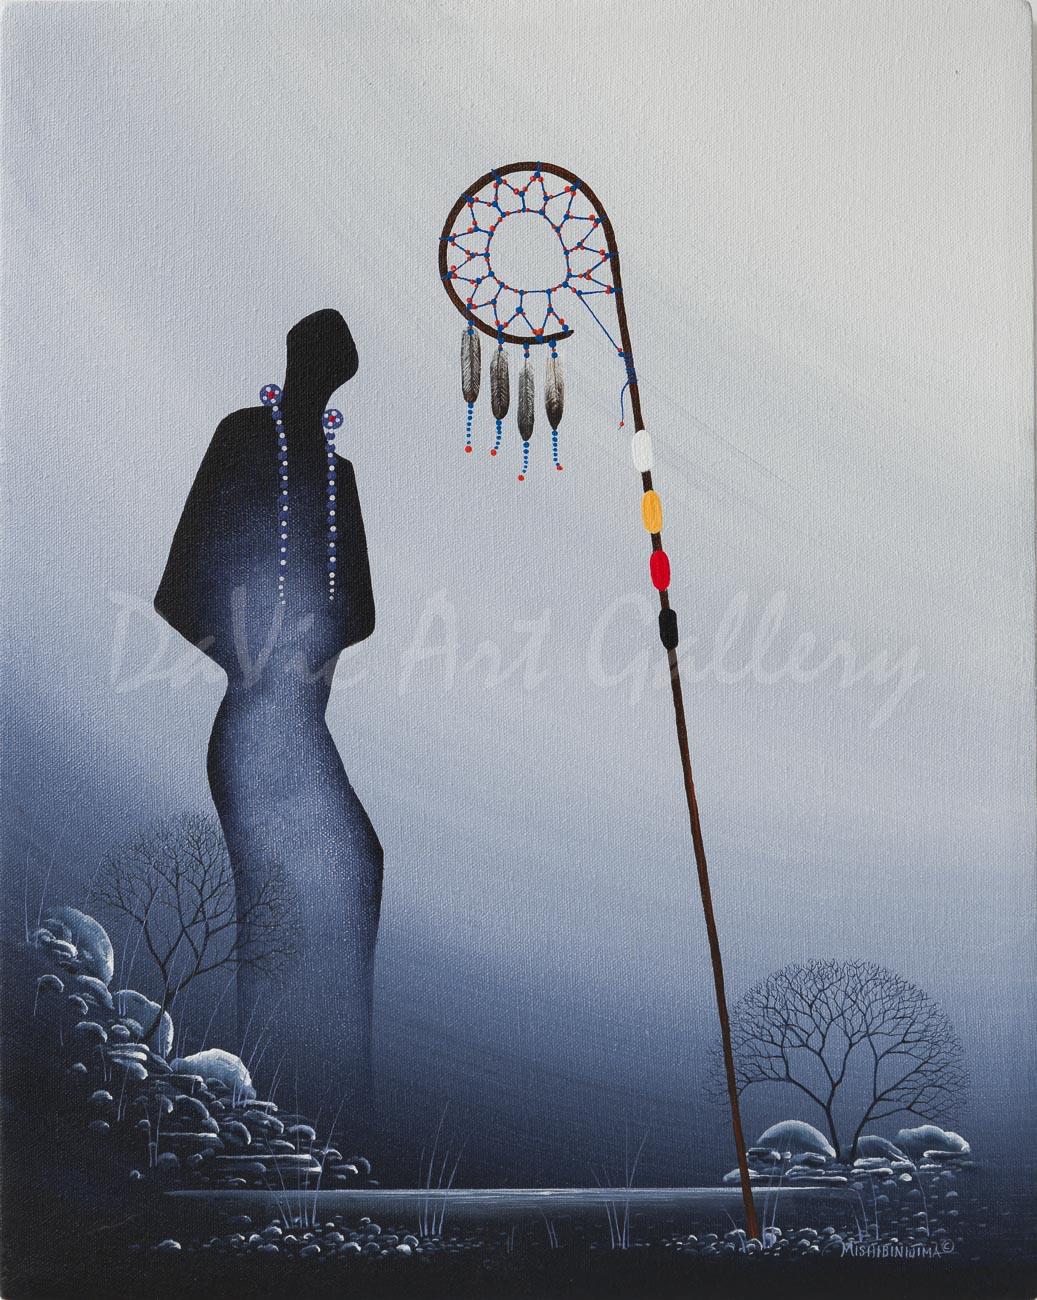 'Respect' by First Nations Ojibway artist James Simon Mishibinijima